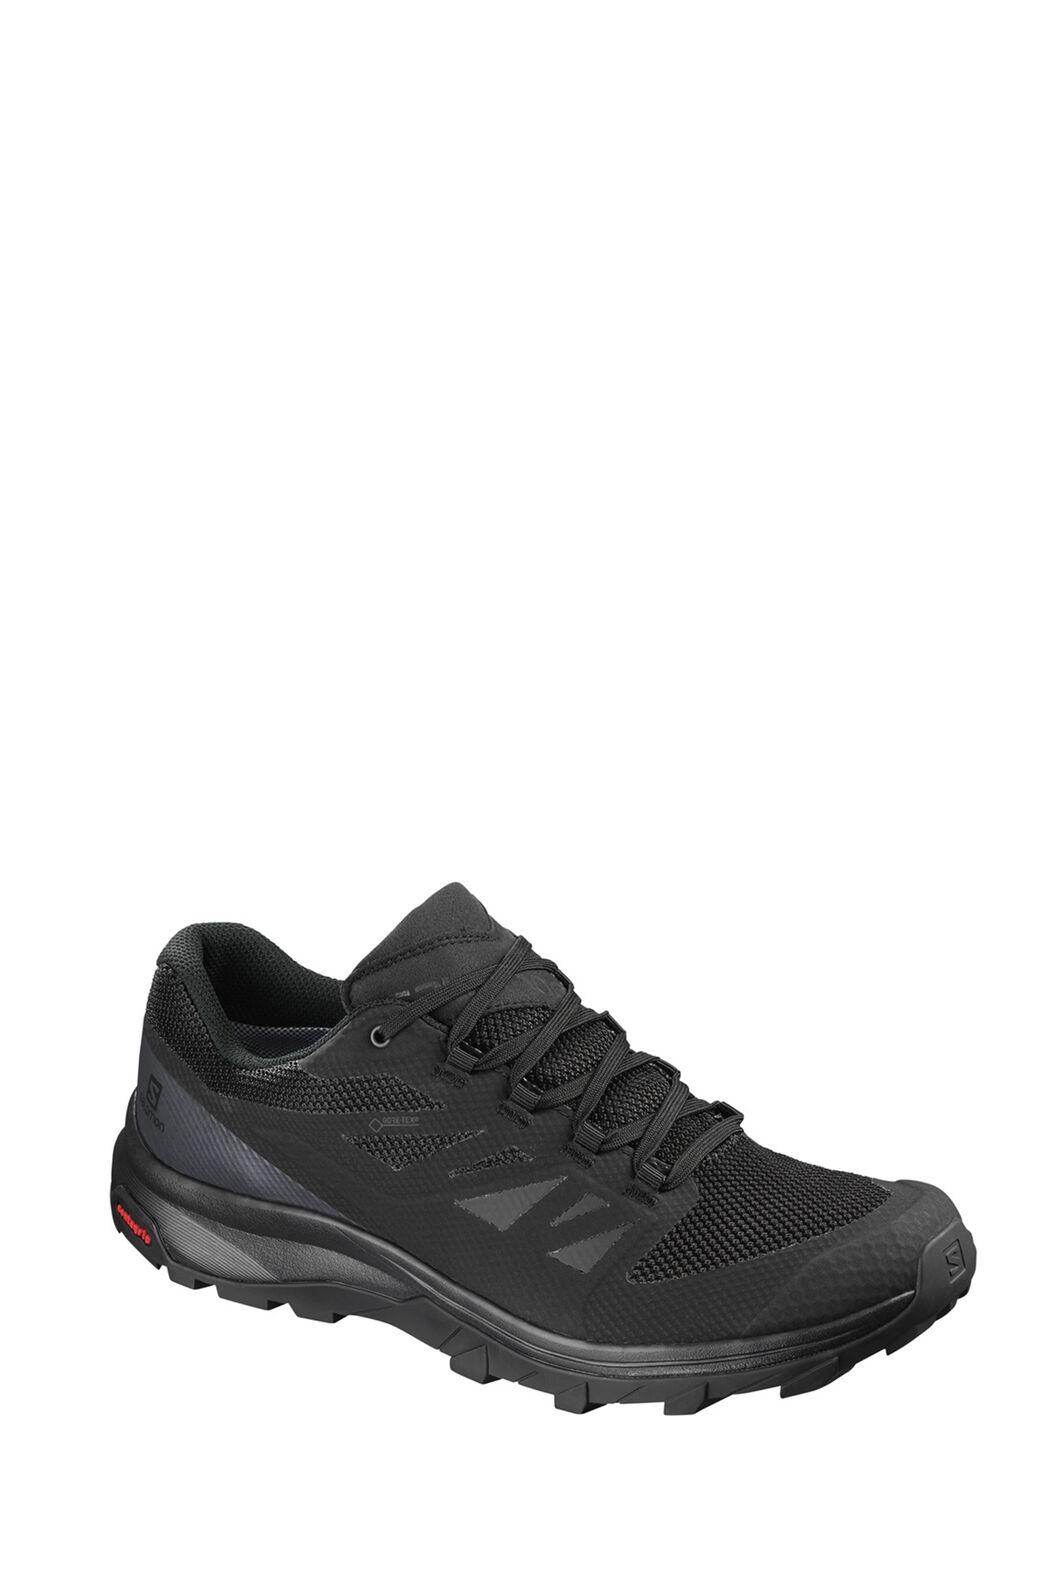 Salomon Outline GTX Hiking Shoes - Men's, Blk/Phantom/Magnet, hi-res